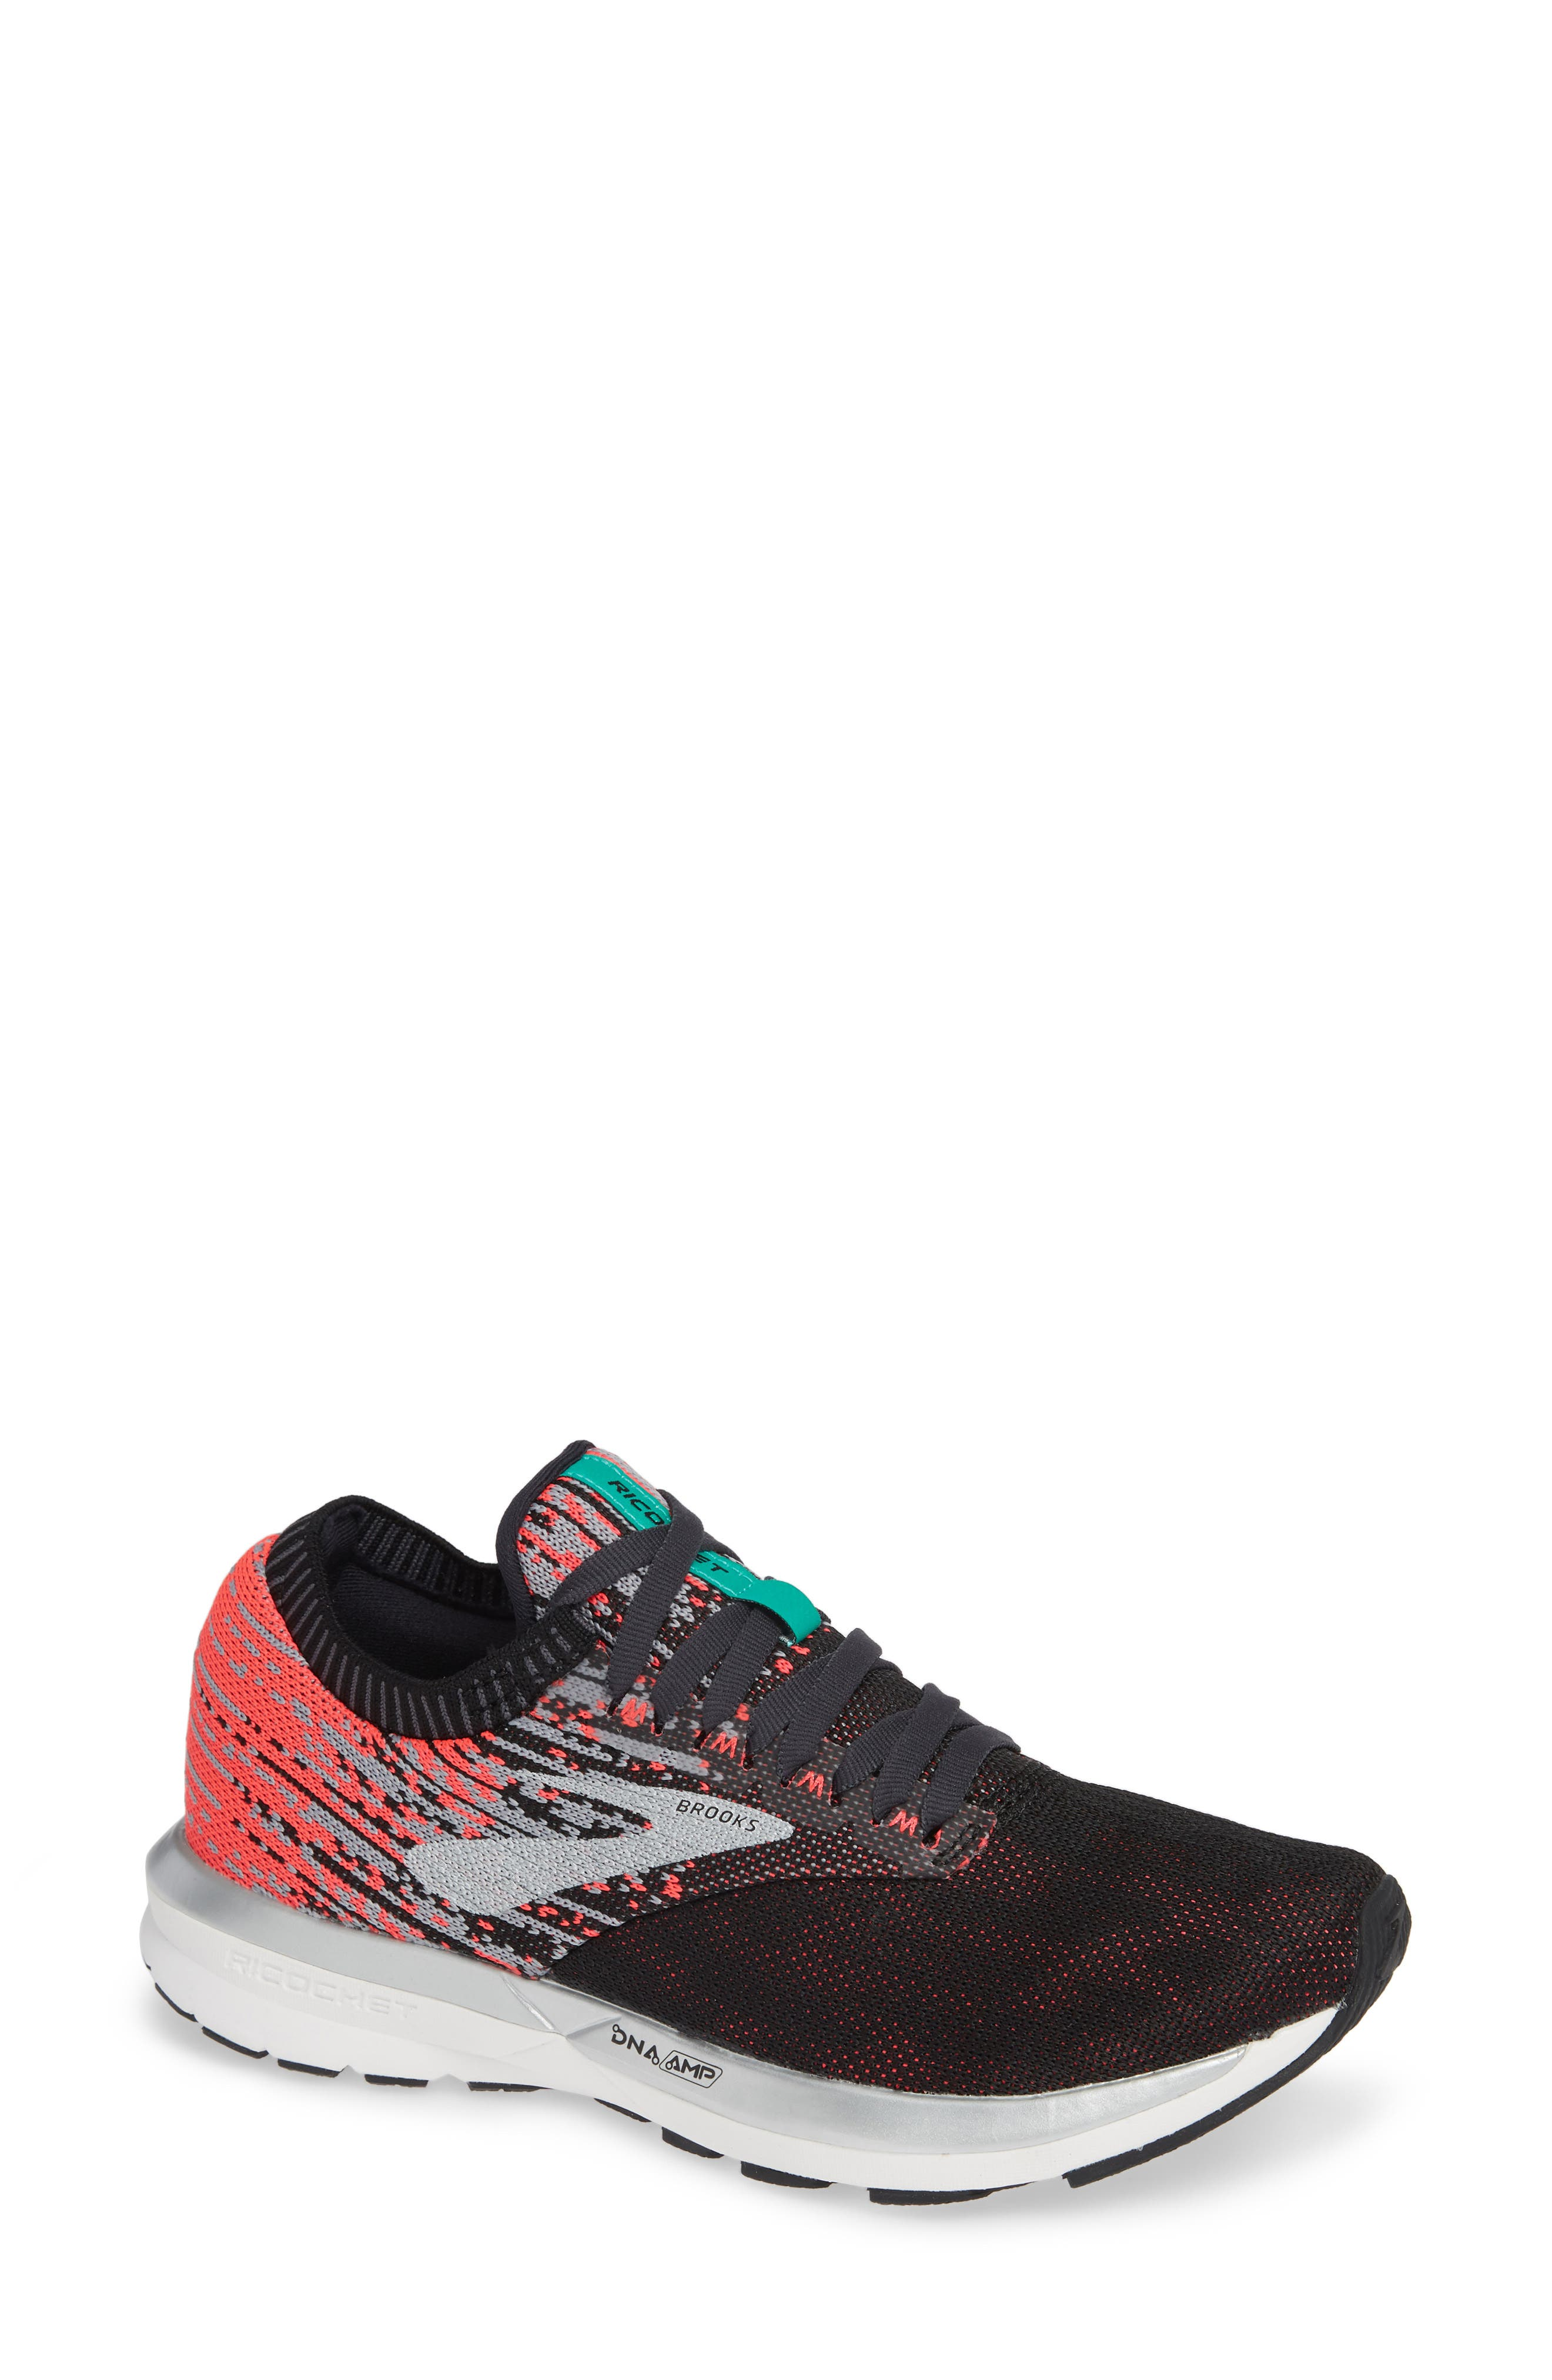 Brooks Ricochet Running Shoe, Black